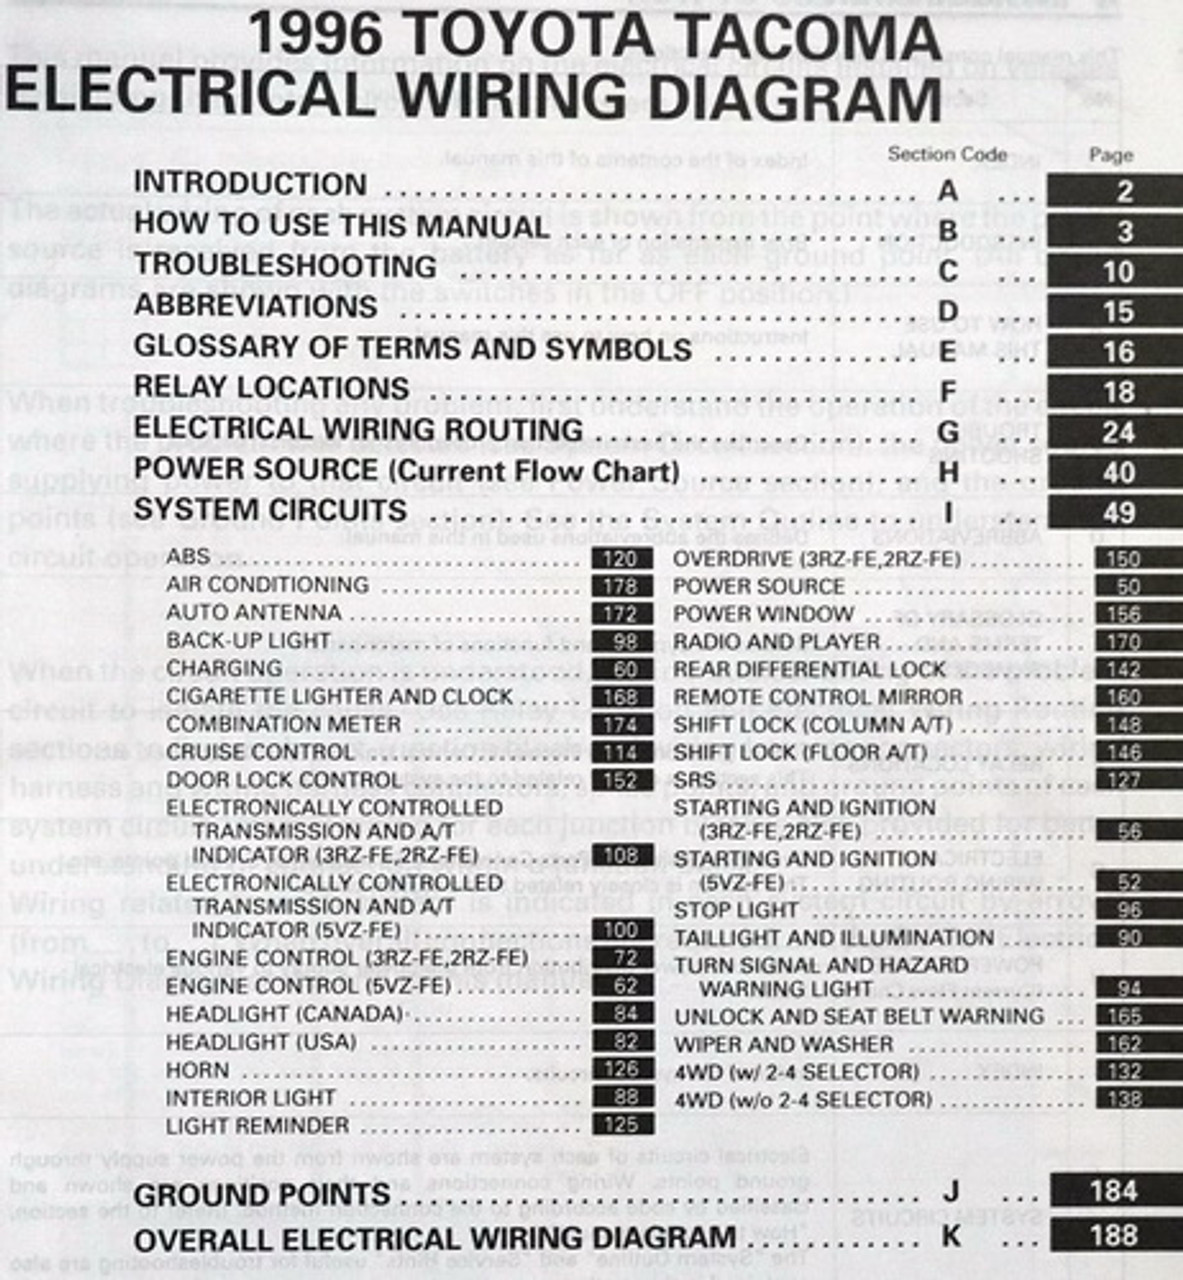 1996 Toyota Tacoma Electrical Wiring Diagrams Original